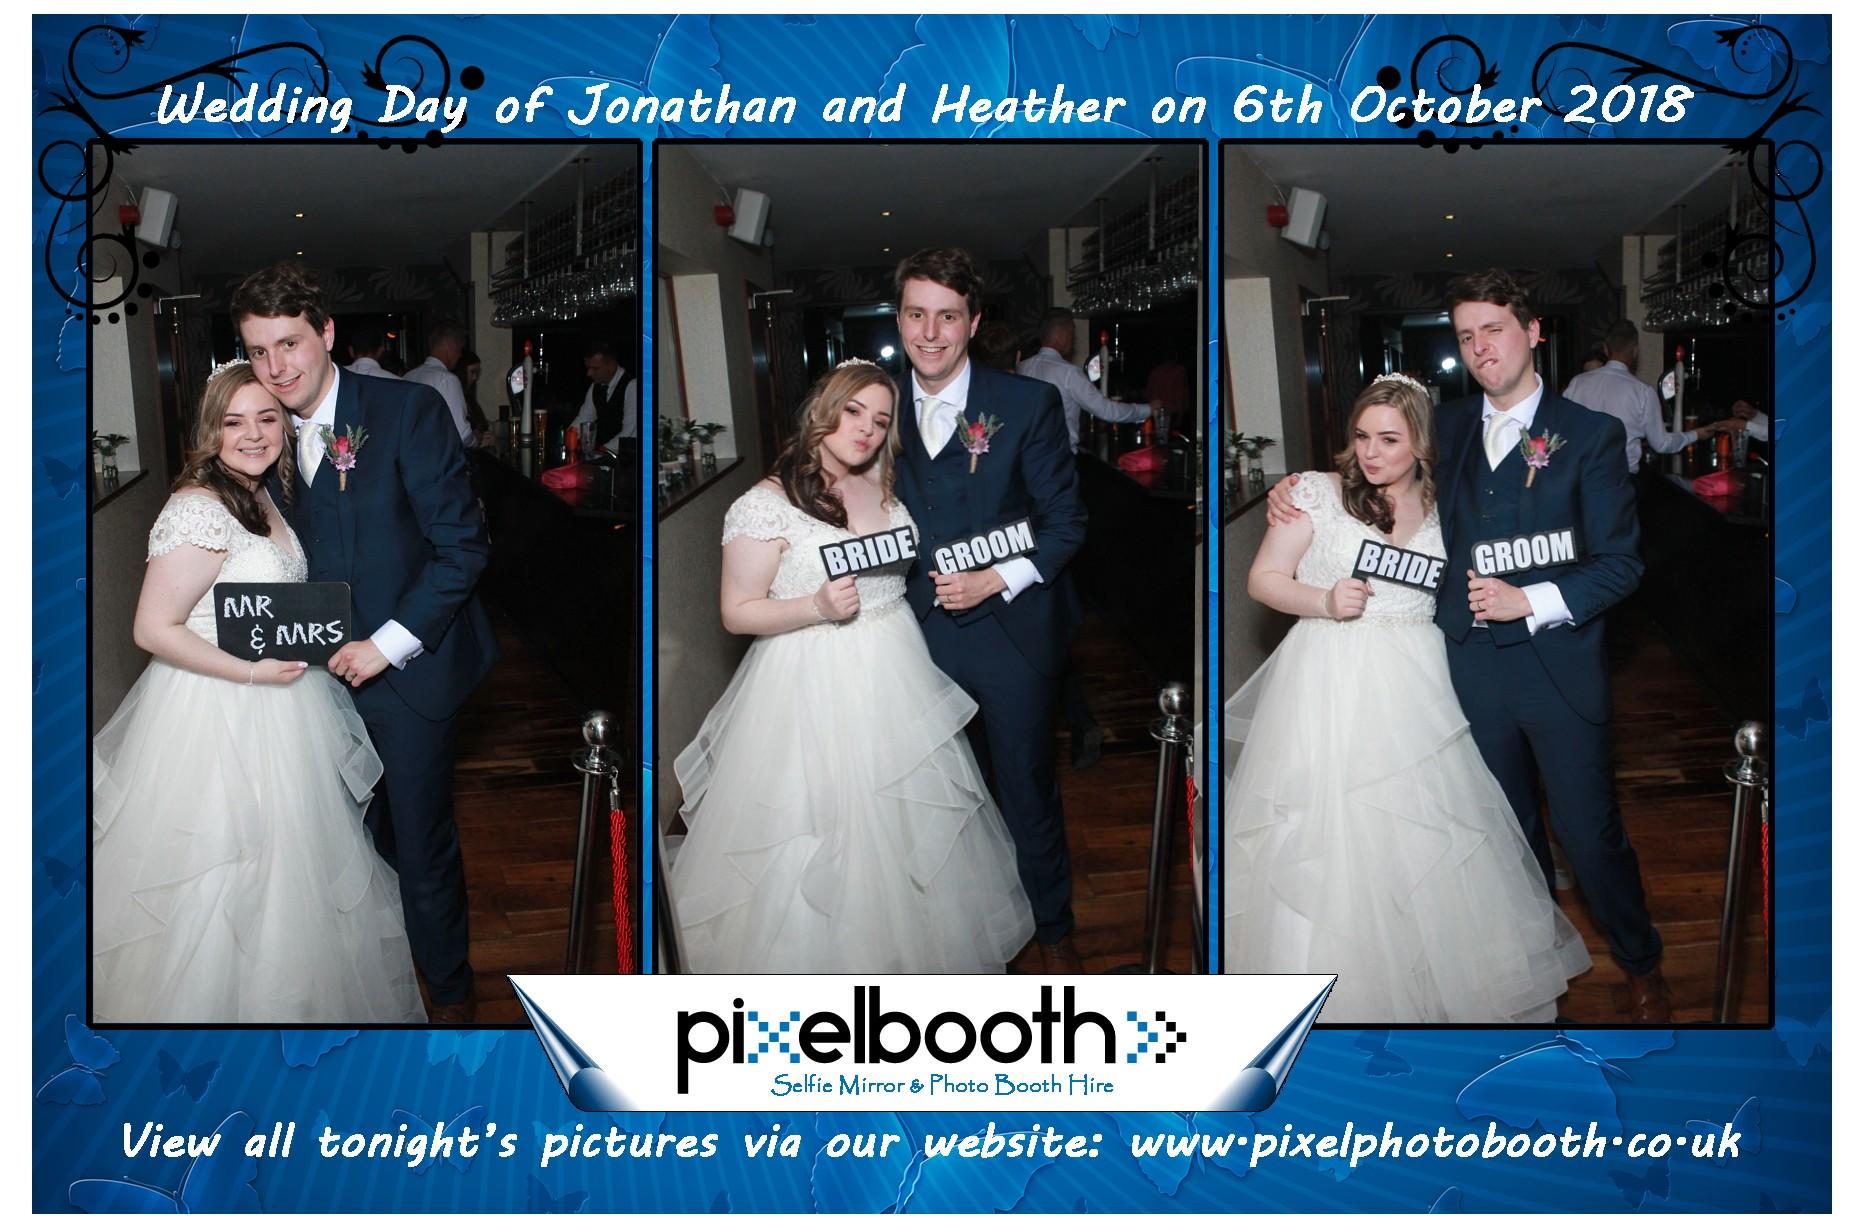 6th Oct 2018: Heather and Jonathan's Wedding at Sheldrakes